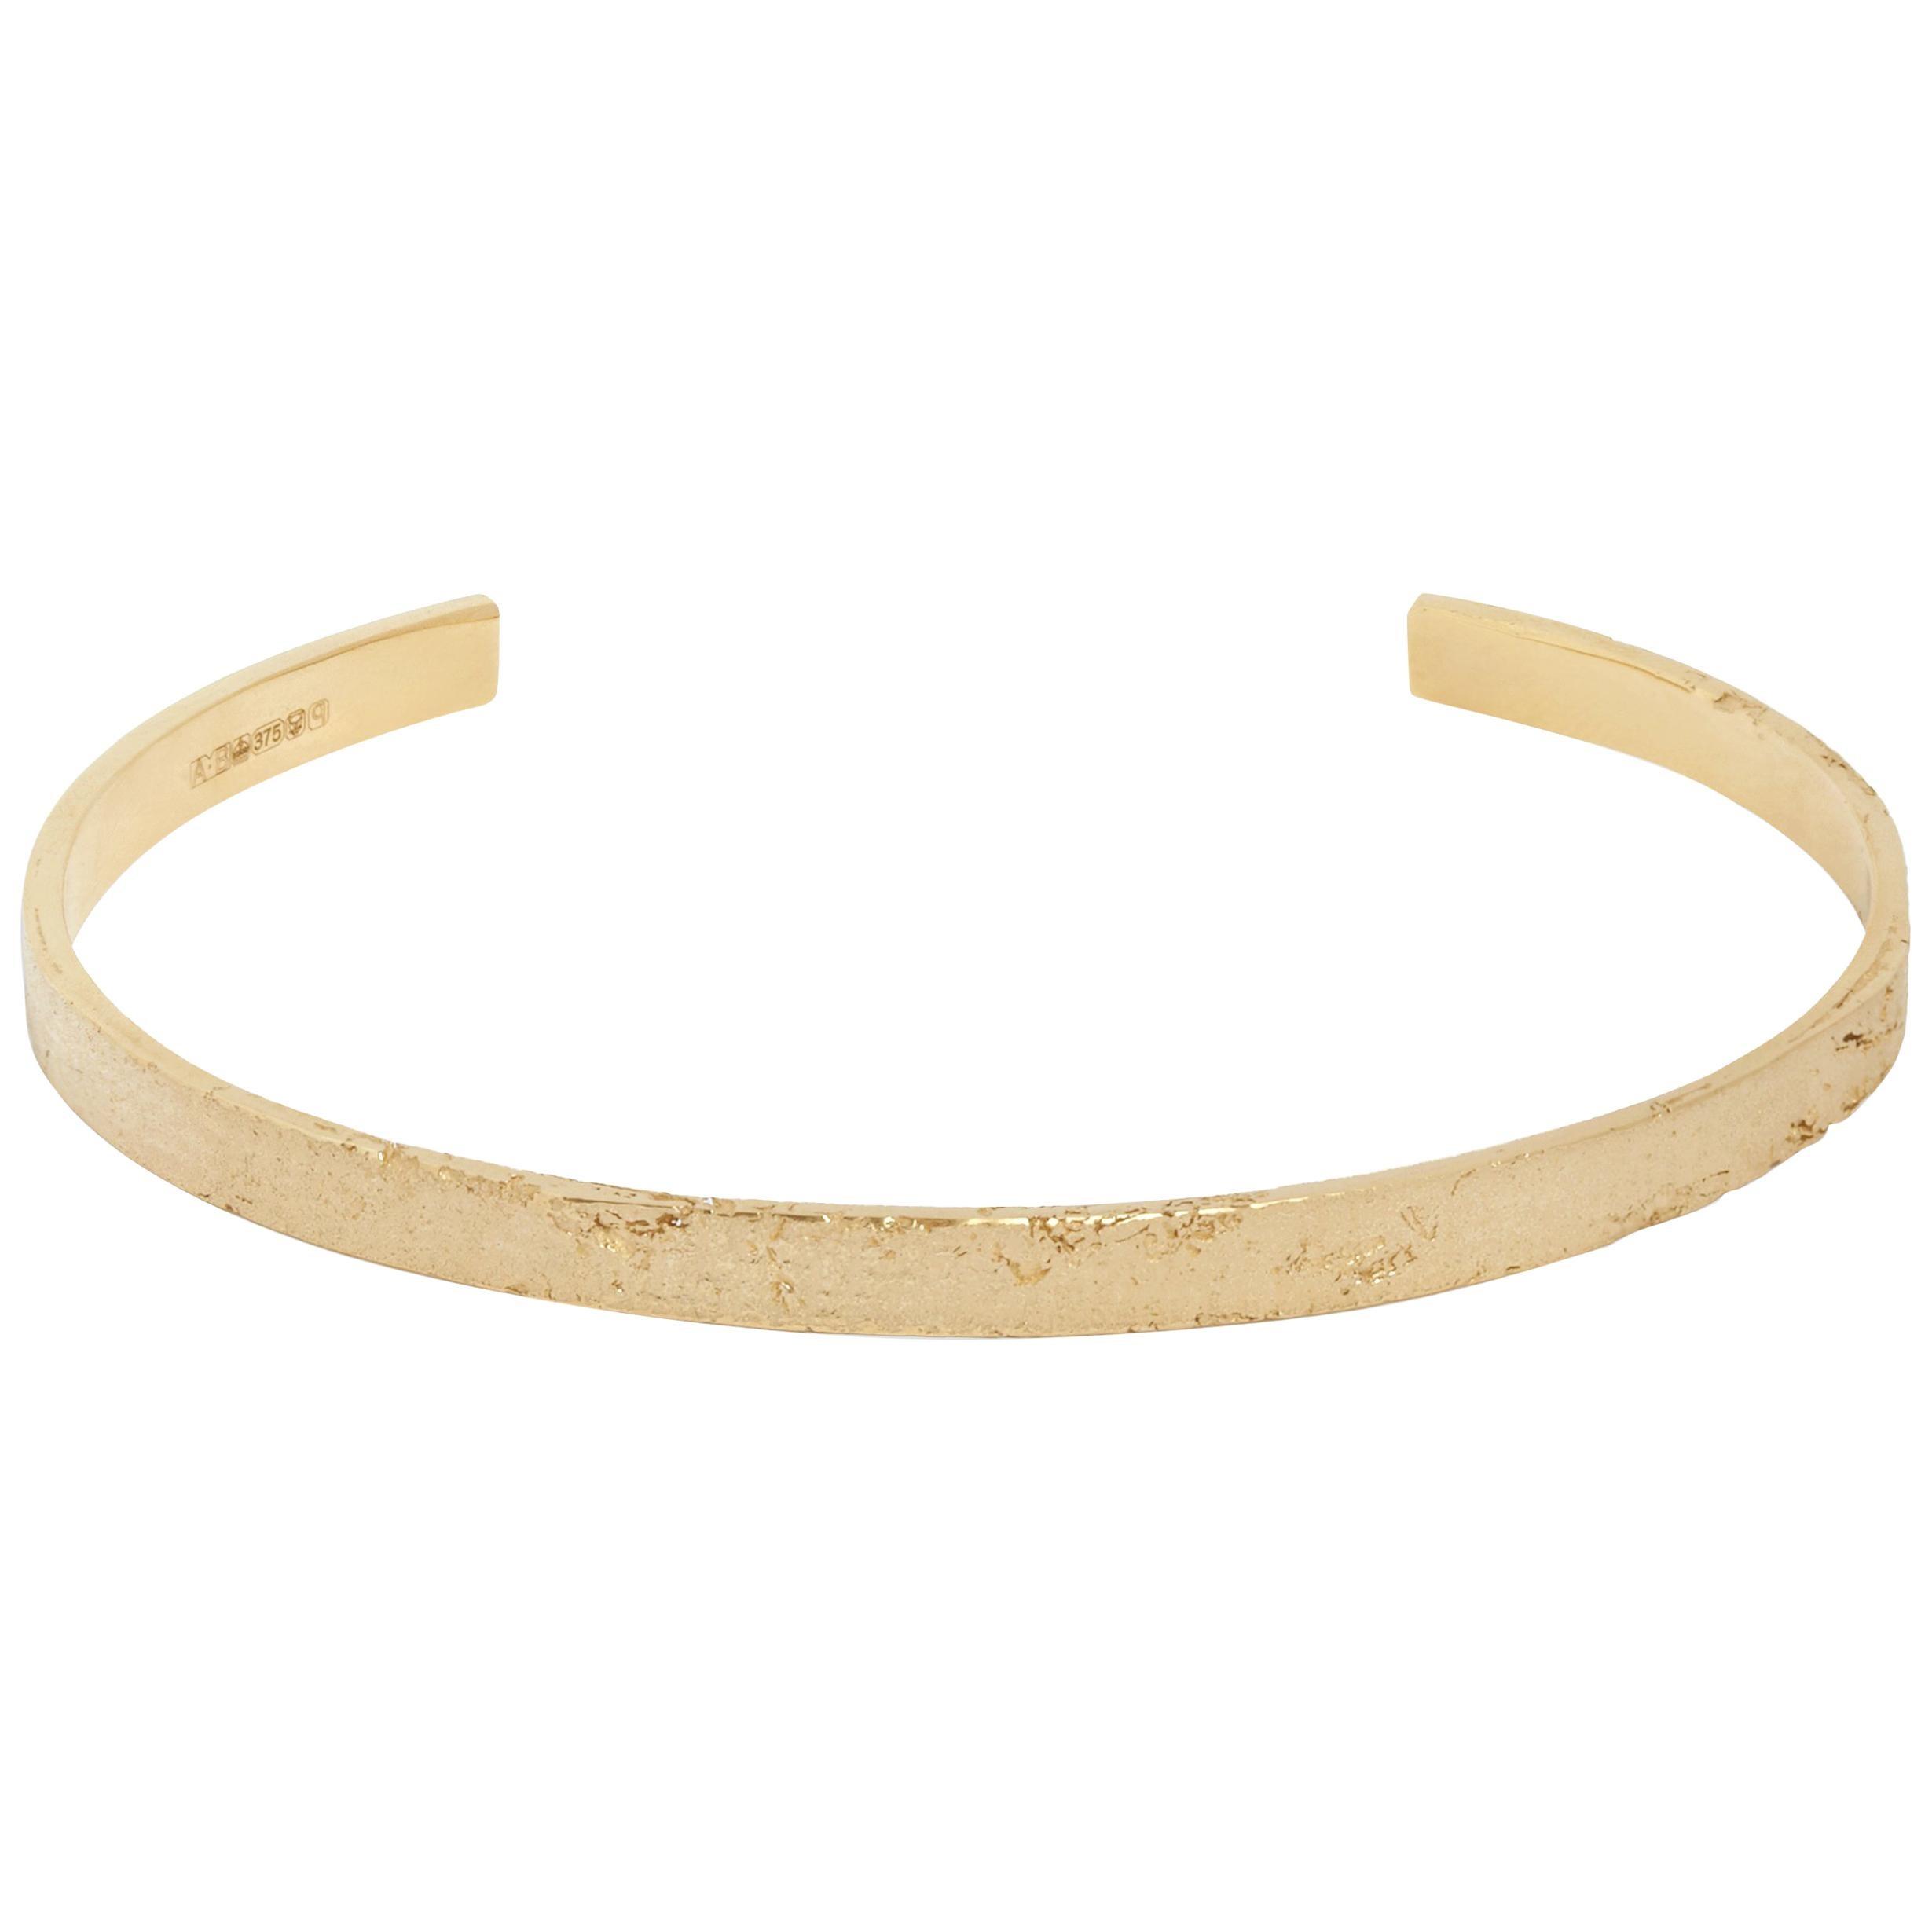 Men's Yellow Gold Paper Cuff Bracelet by Allison Bryan